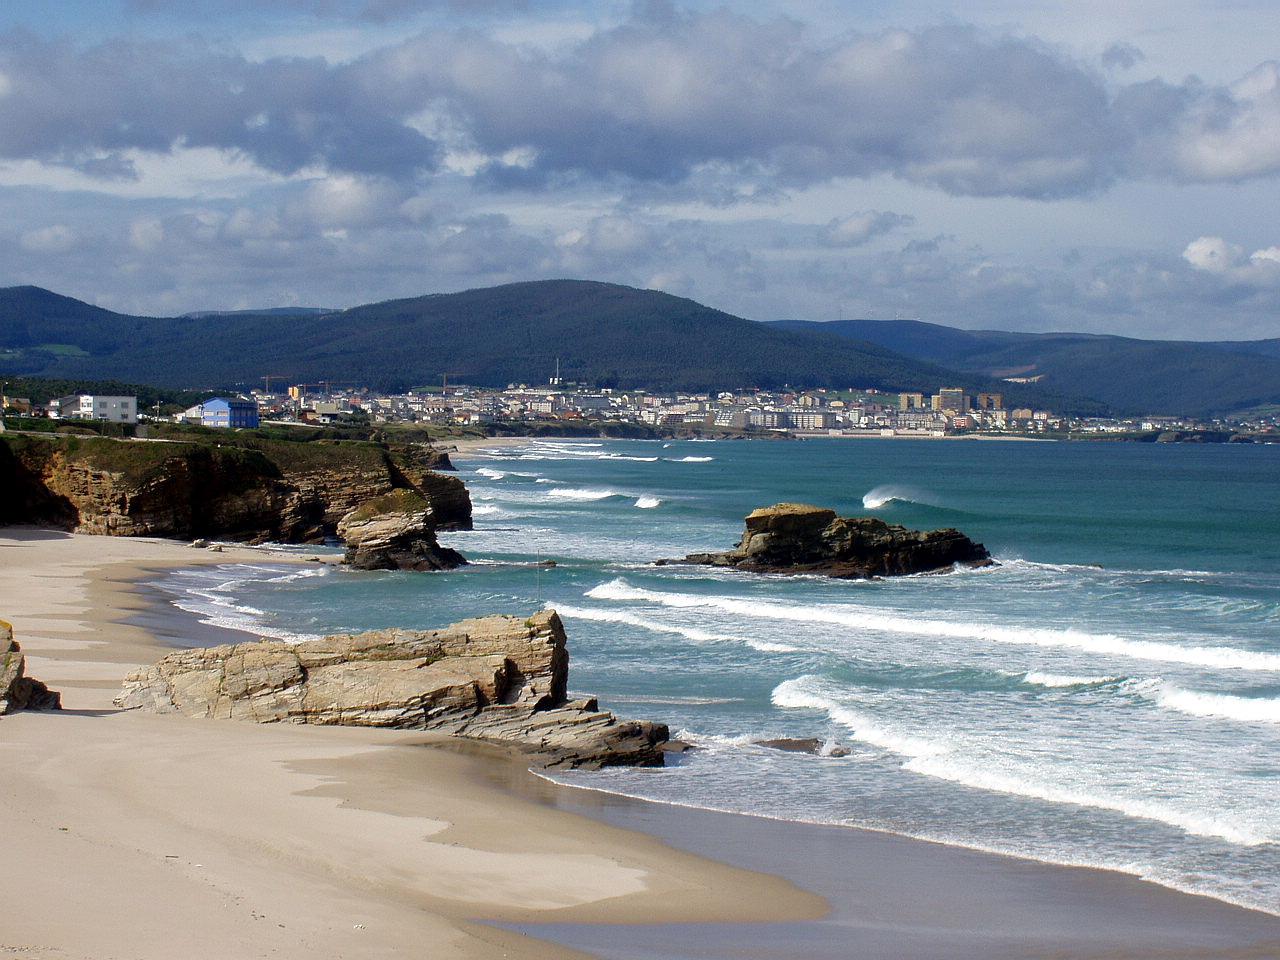 Playa San Cosme / Altar